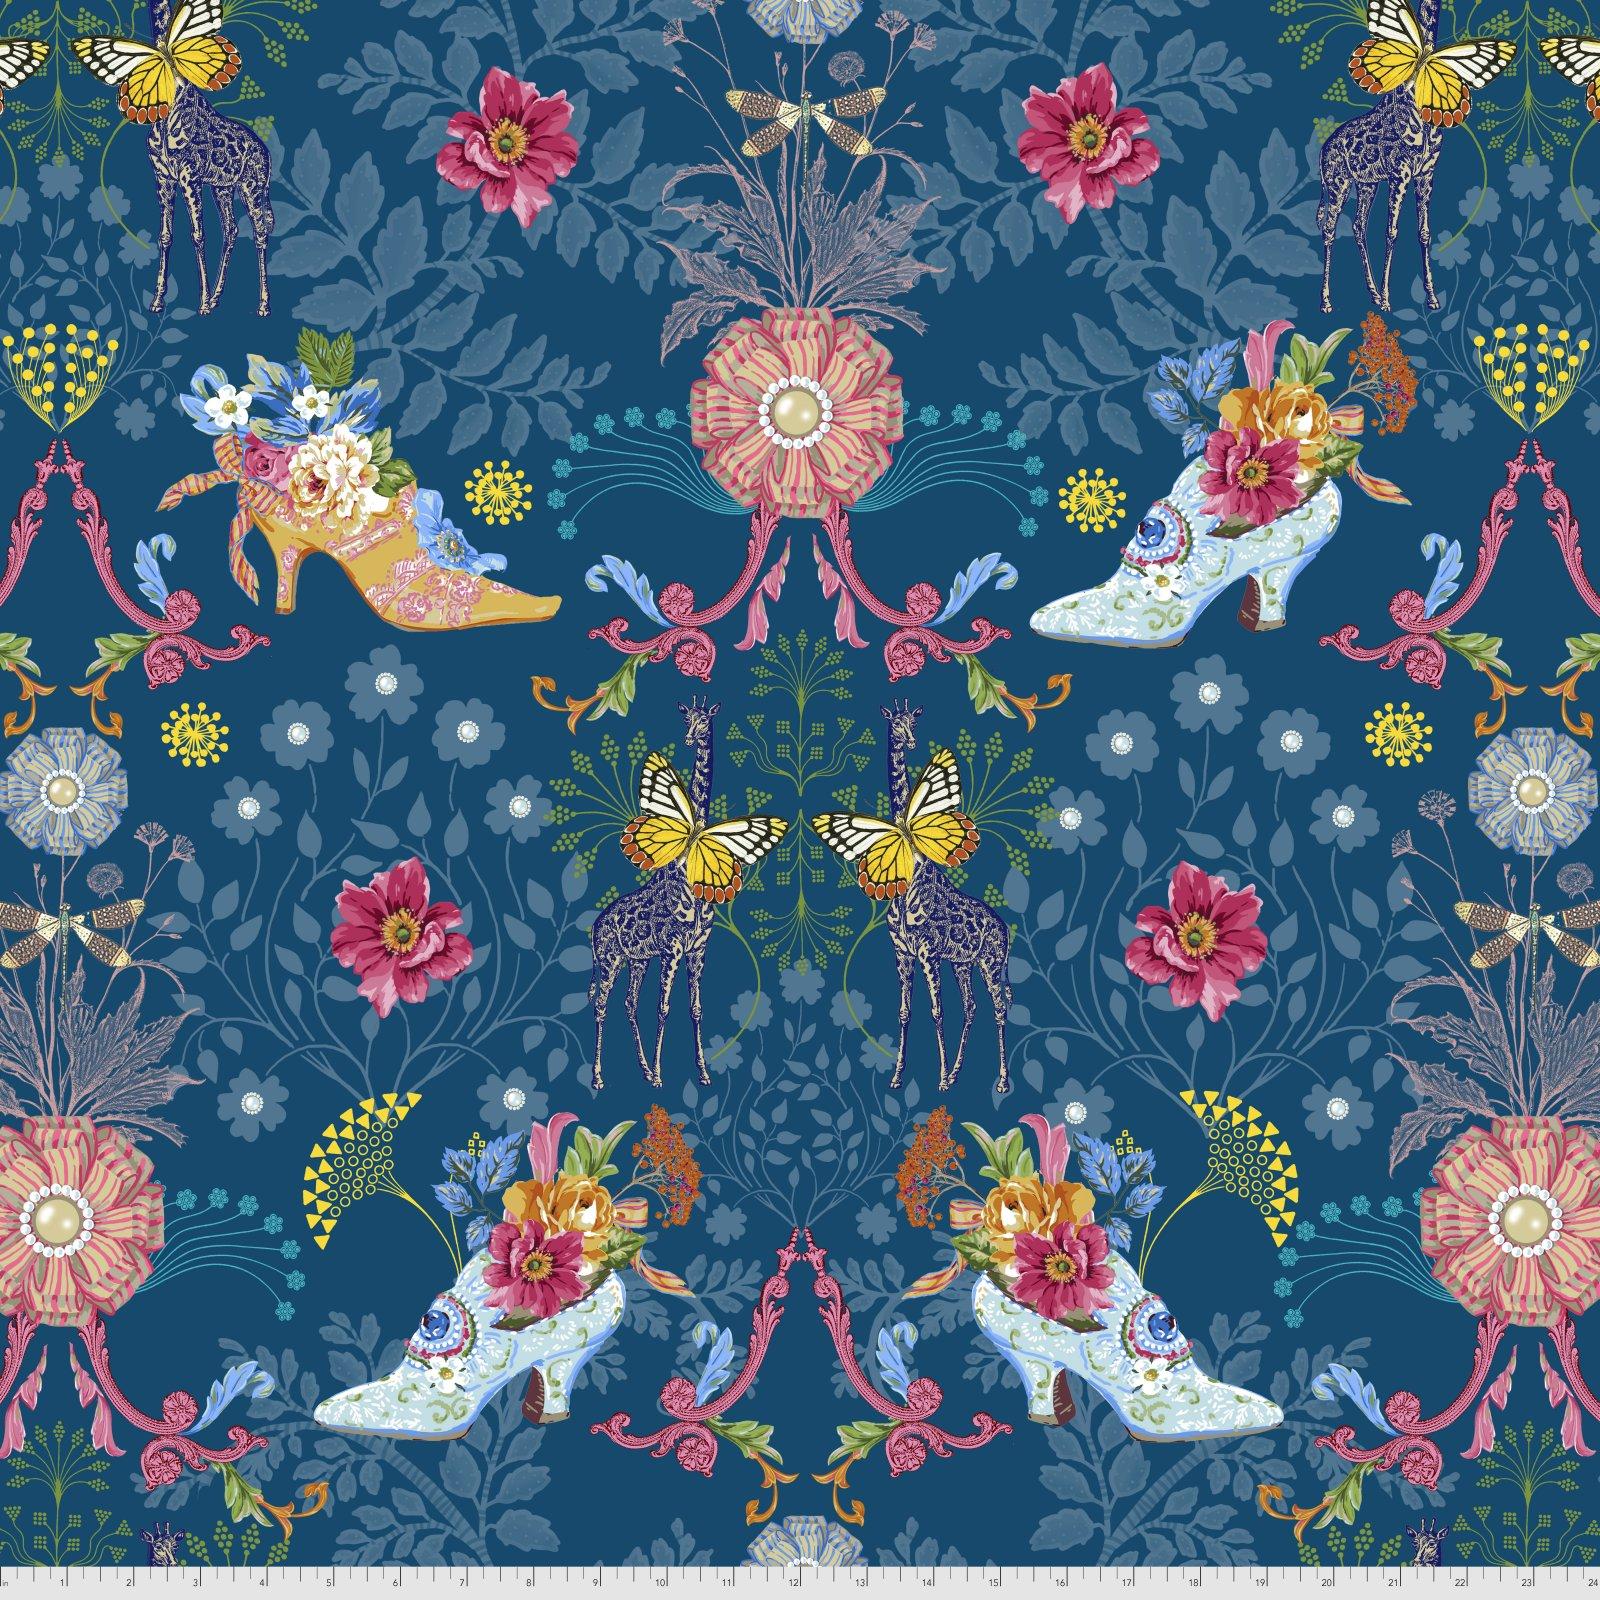 Jardin de la Reine by Odile Bailloeul for Free Spirit Fabrics - Royal Expedition - Teal